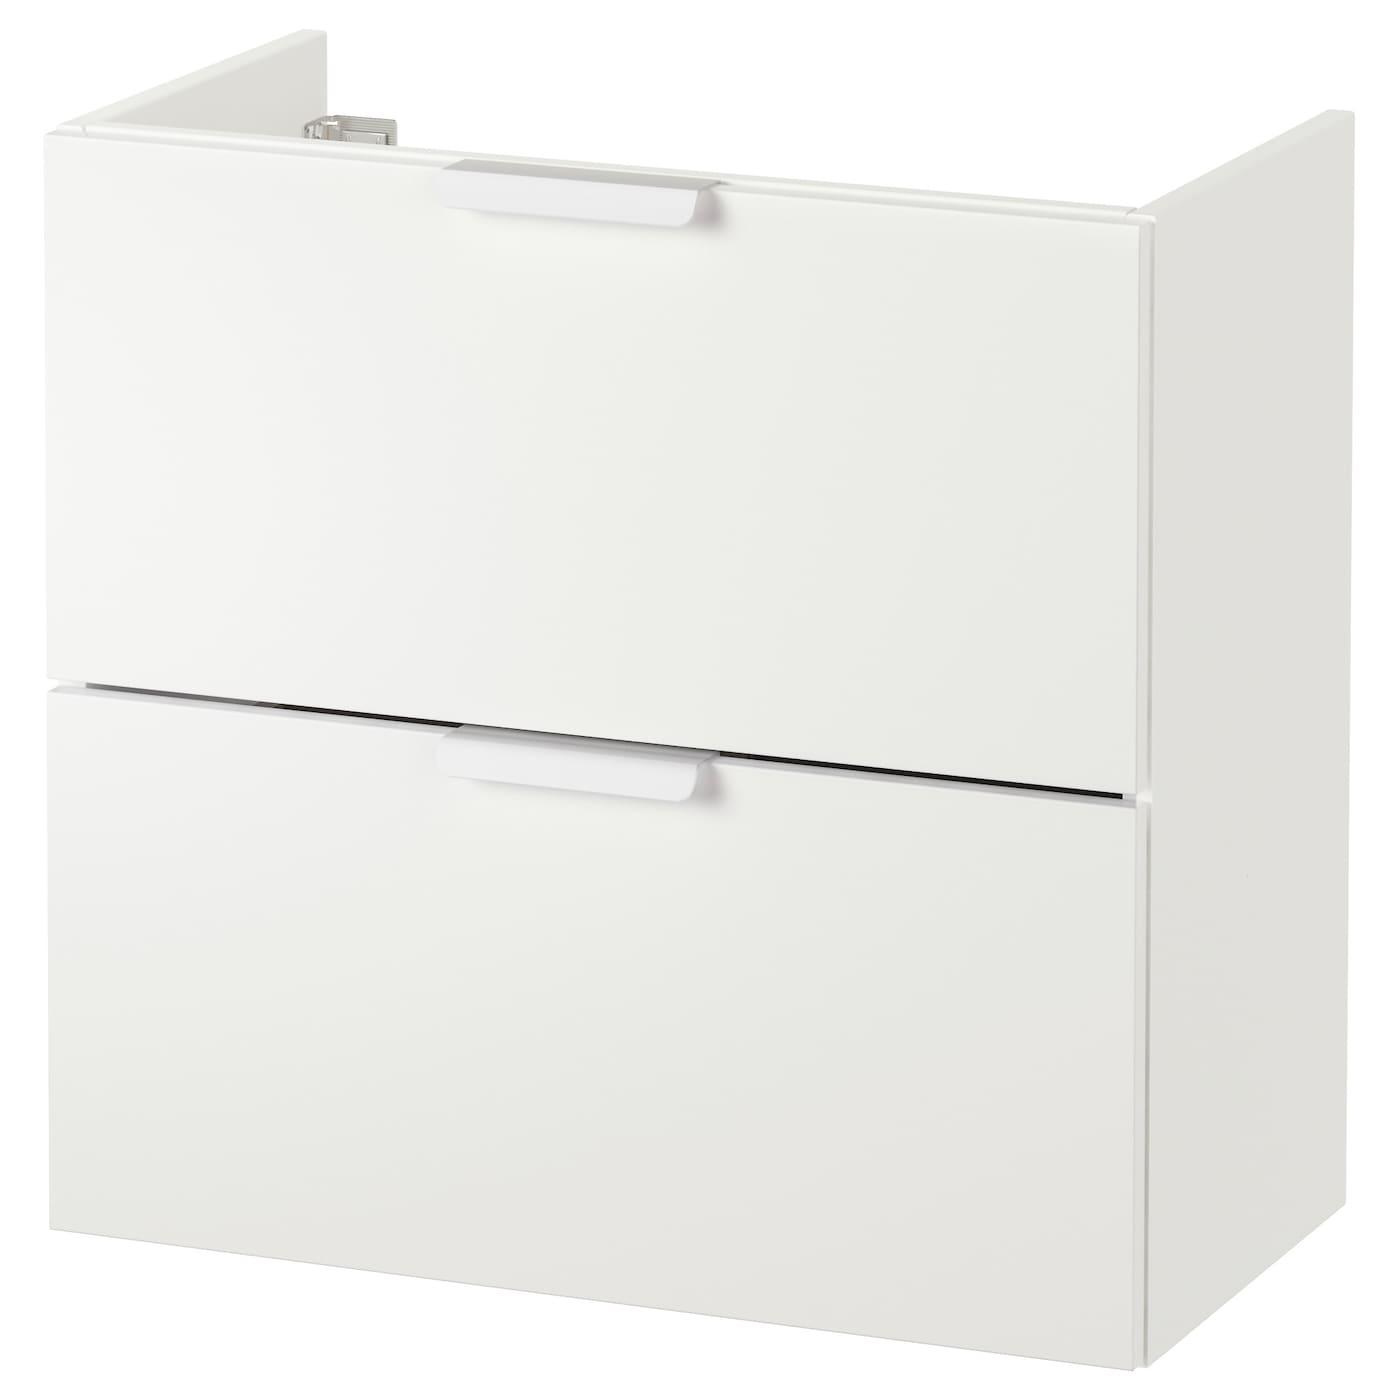 Godmorgon meuble lavabo 2tir blanc 60x32x58 cm ikea for Ikea meuble lavabo